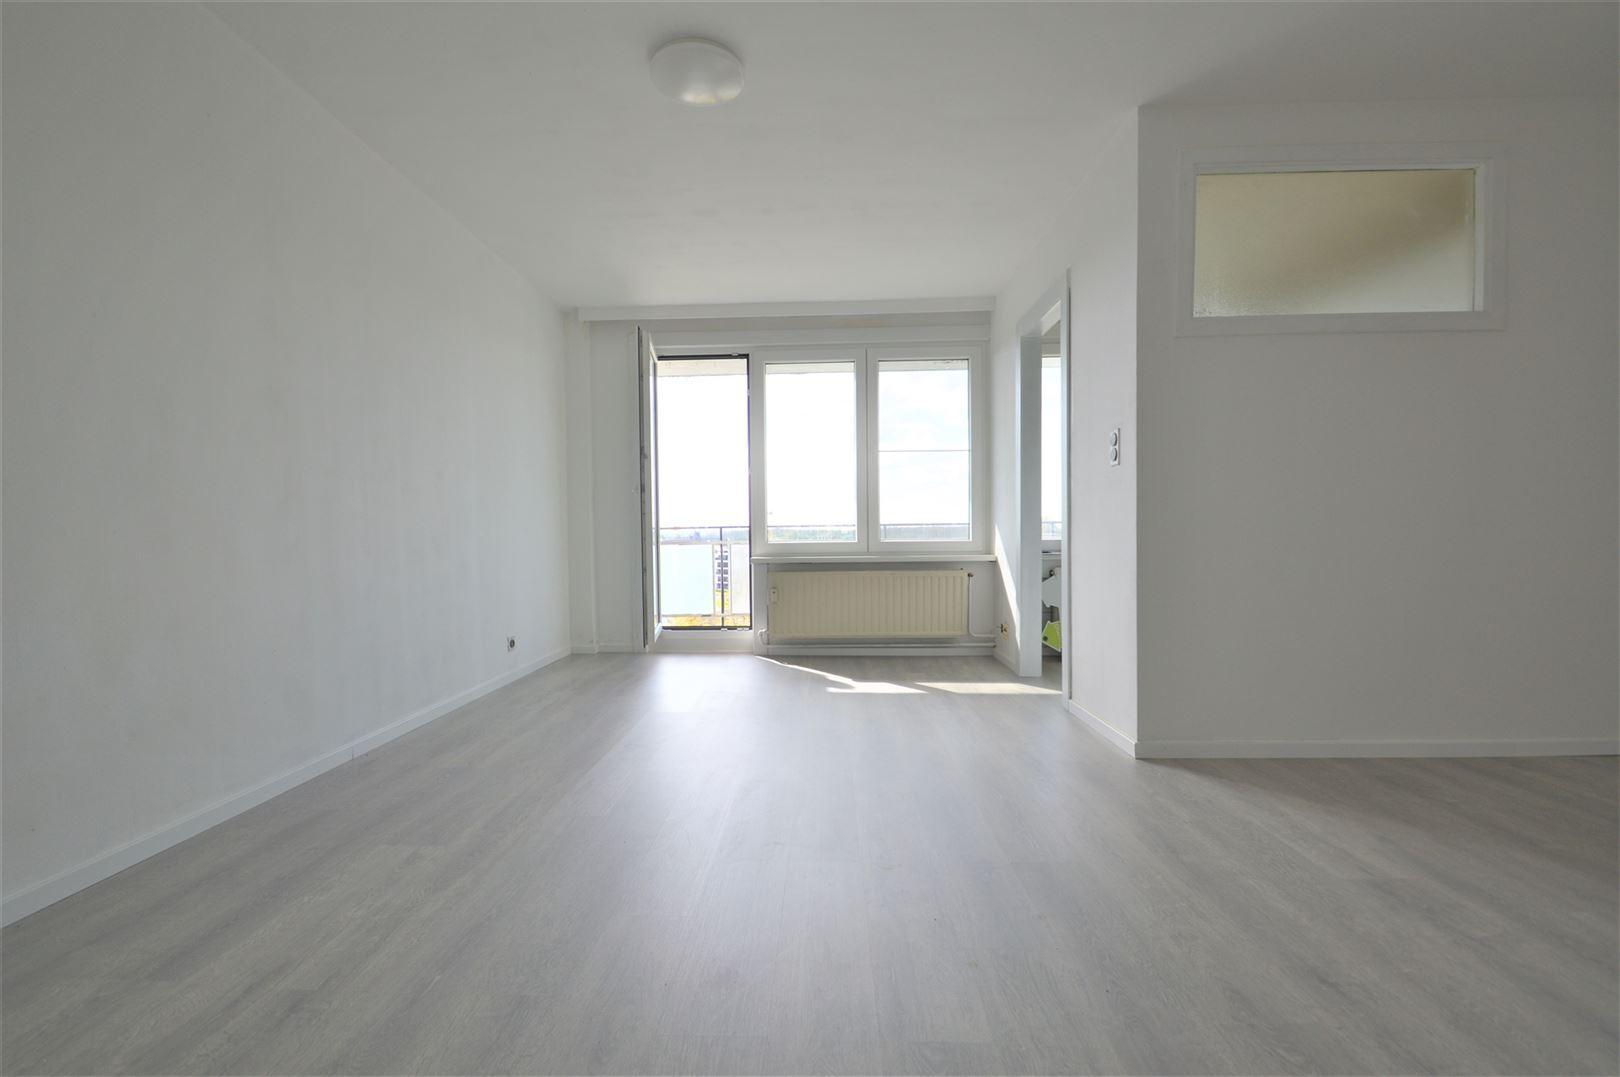 Foto 1 : Flat/studio te 9200 Dendermonde (België) - Prijs € 500